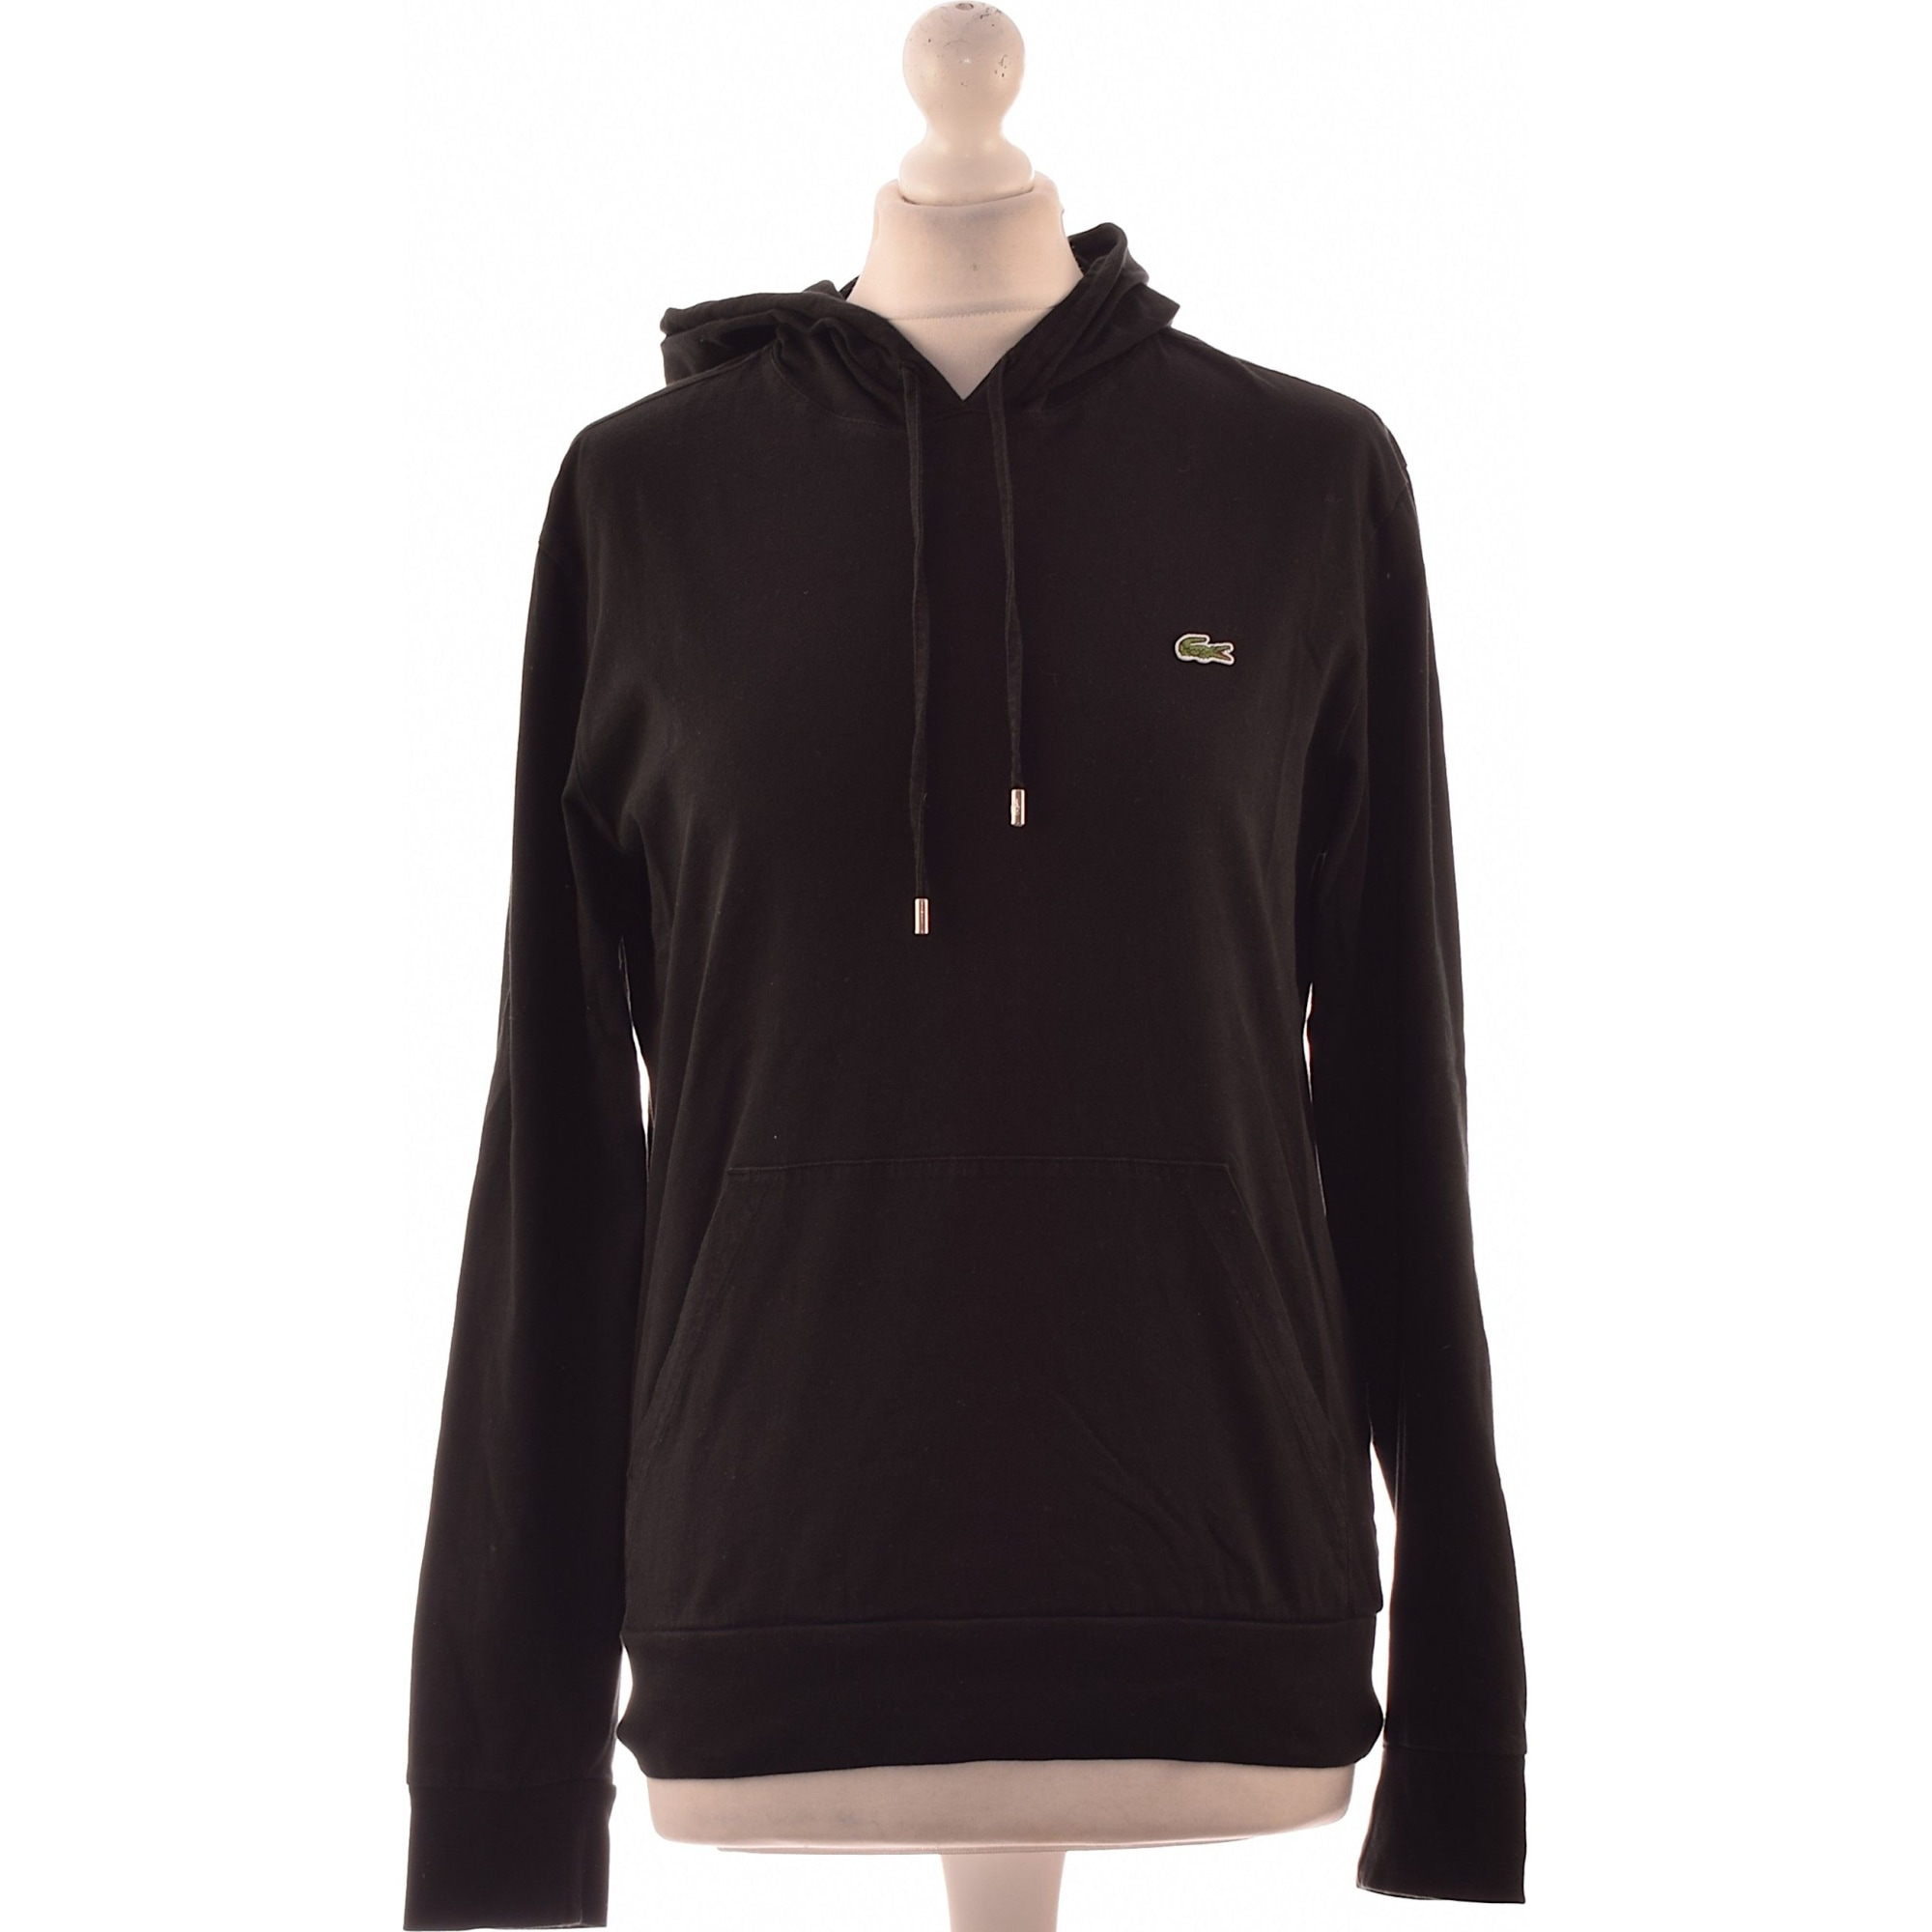 Sweatshirt LACOSTE Black